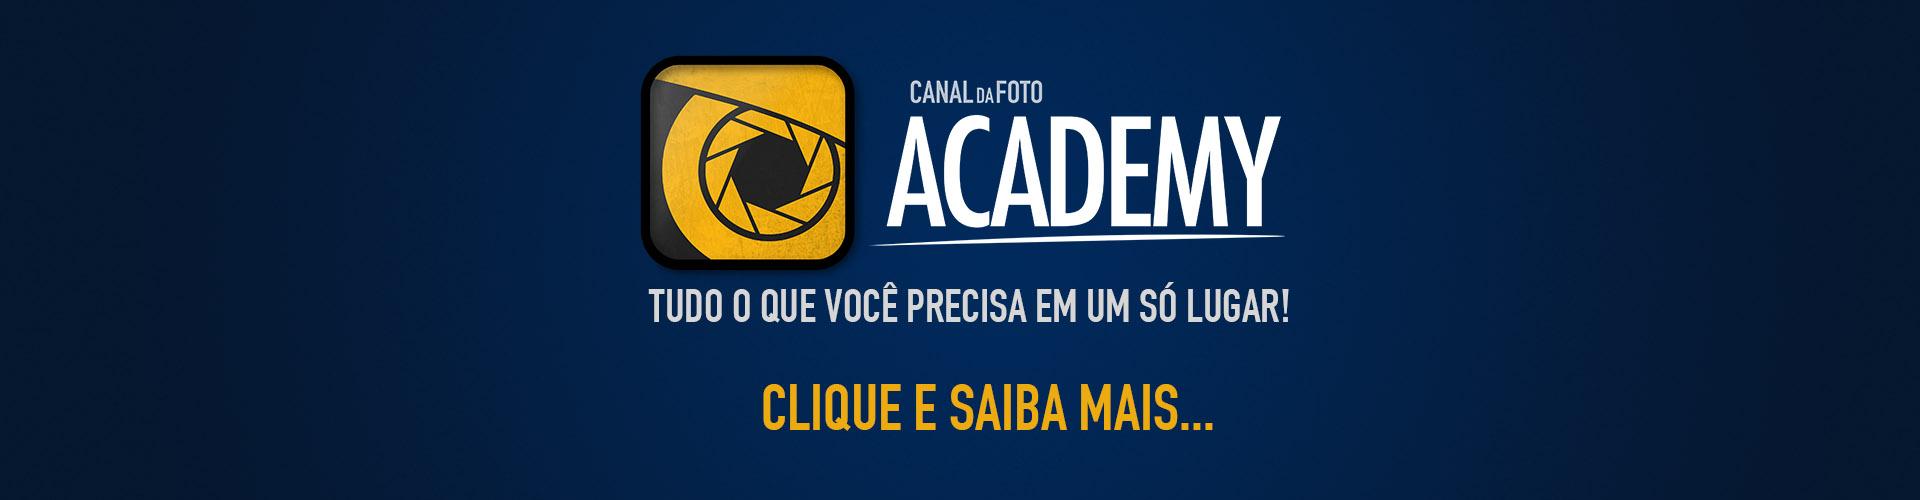 slider-academy-canal-da-foto